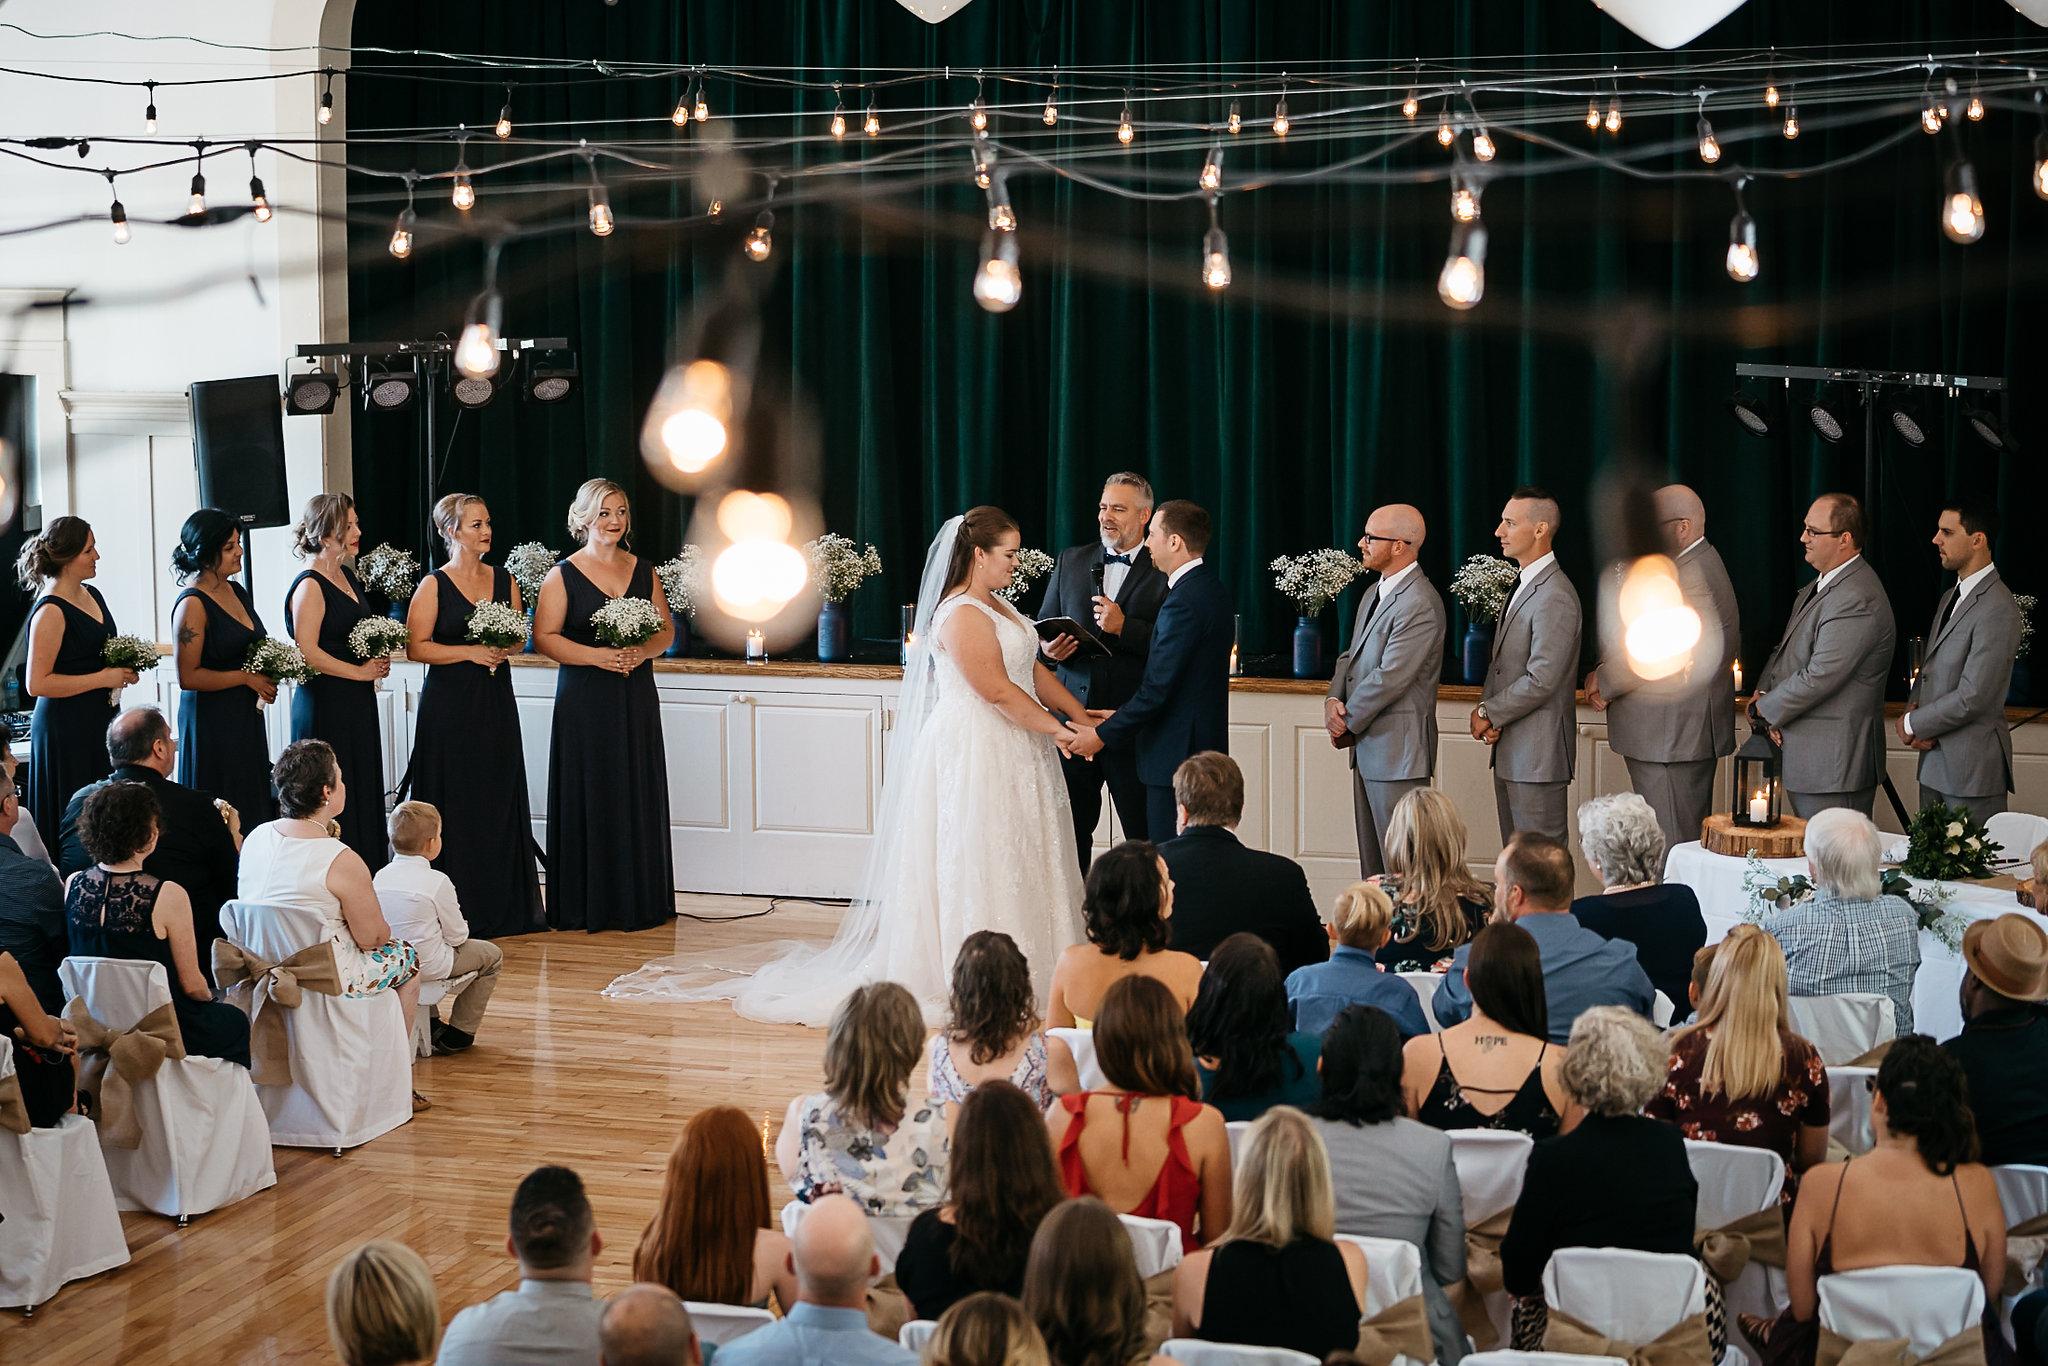 Jen_Kyle_Wedding_03_Ceremony-62.jpg